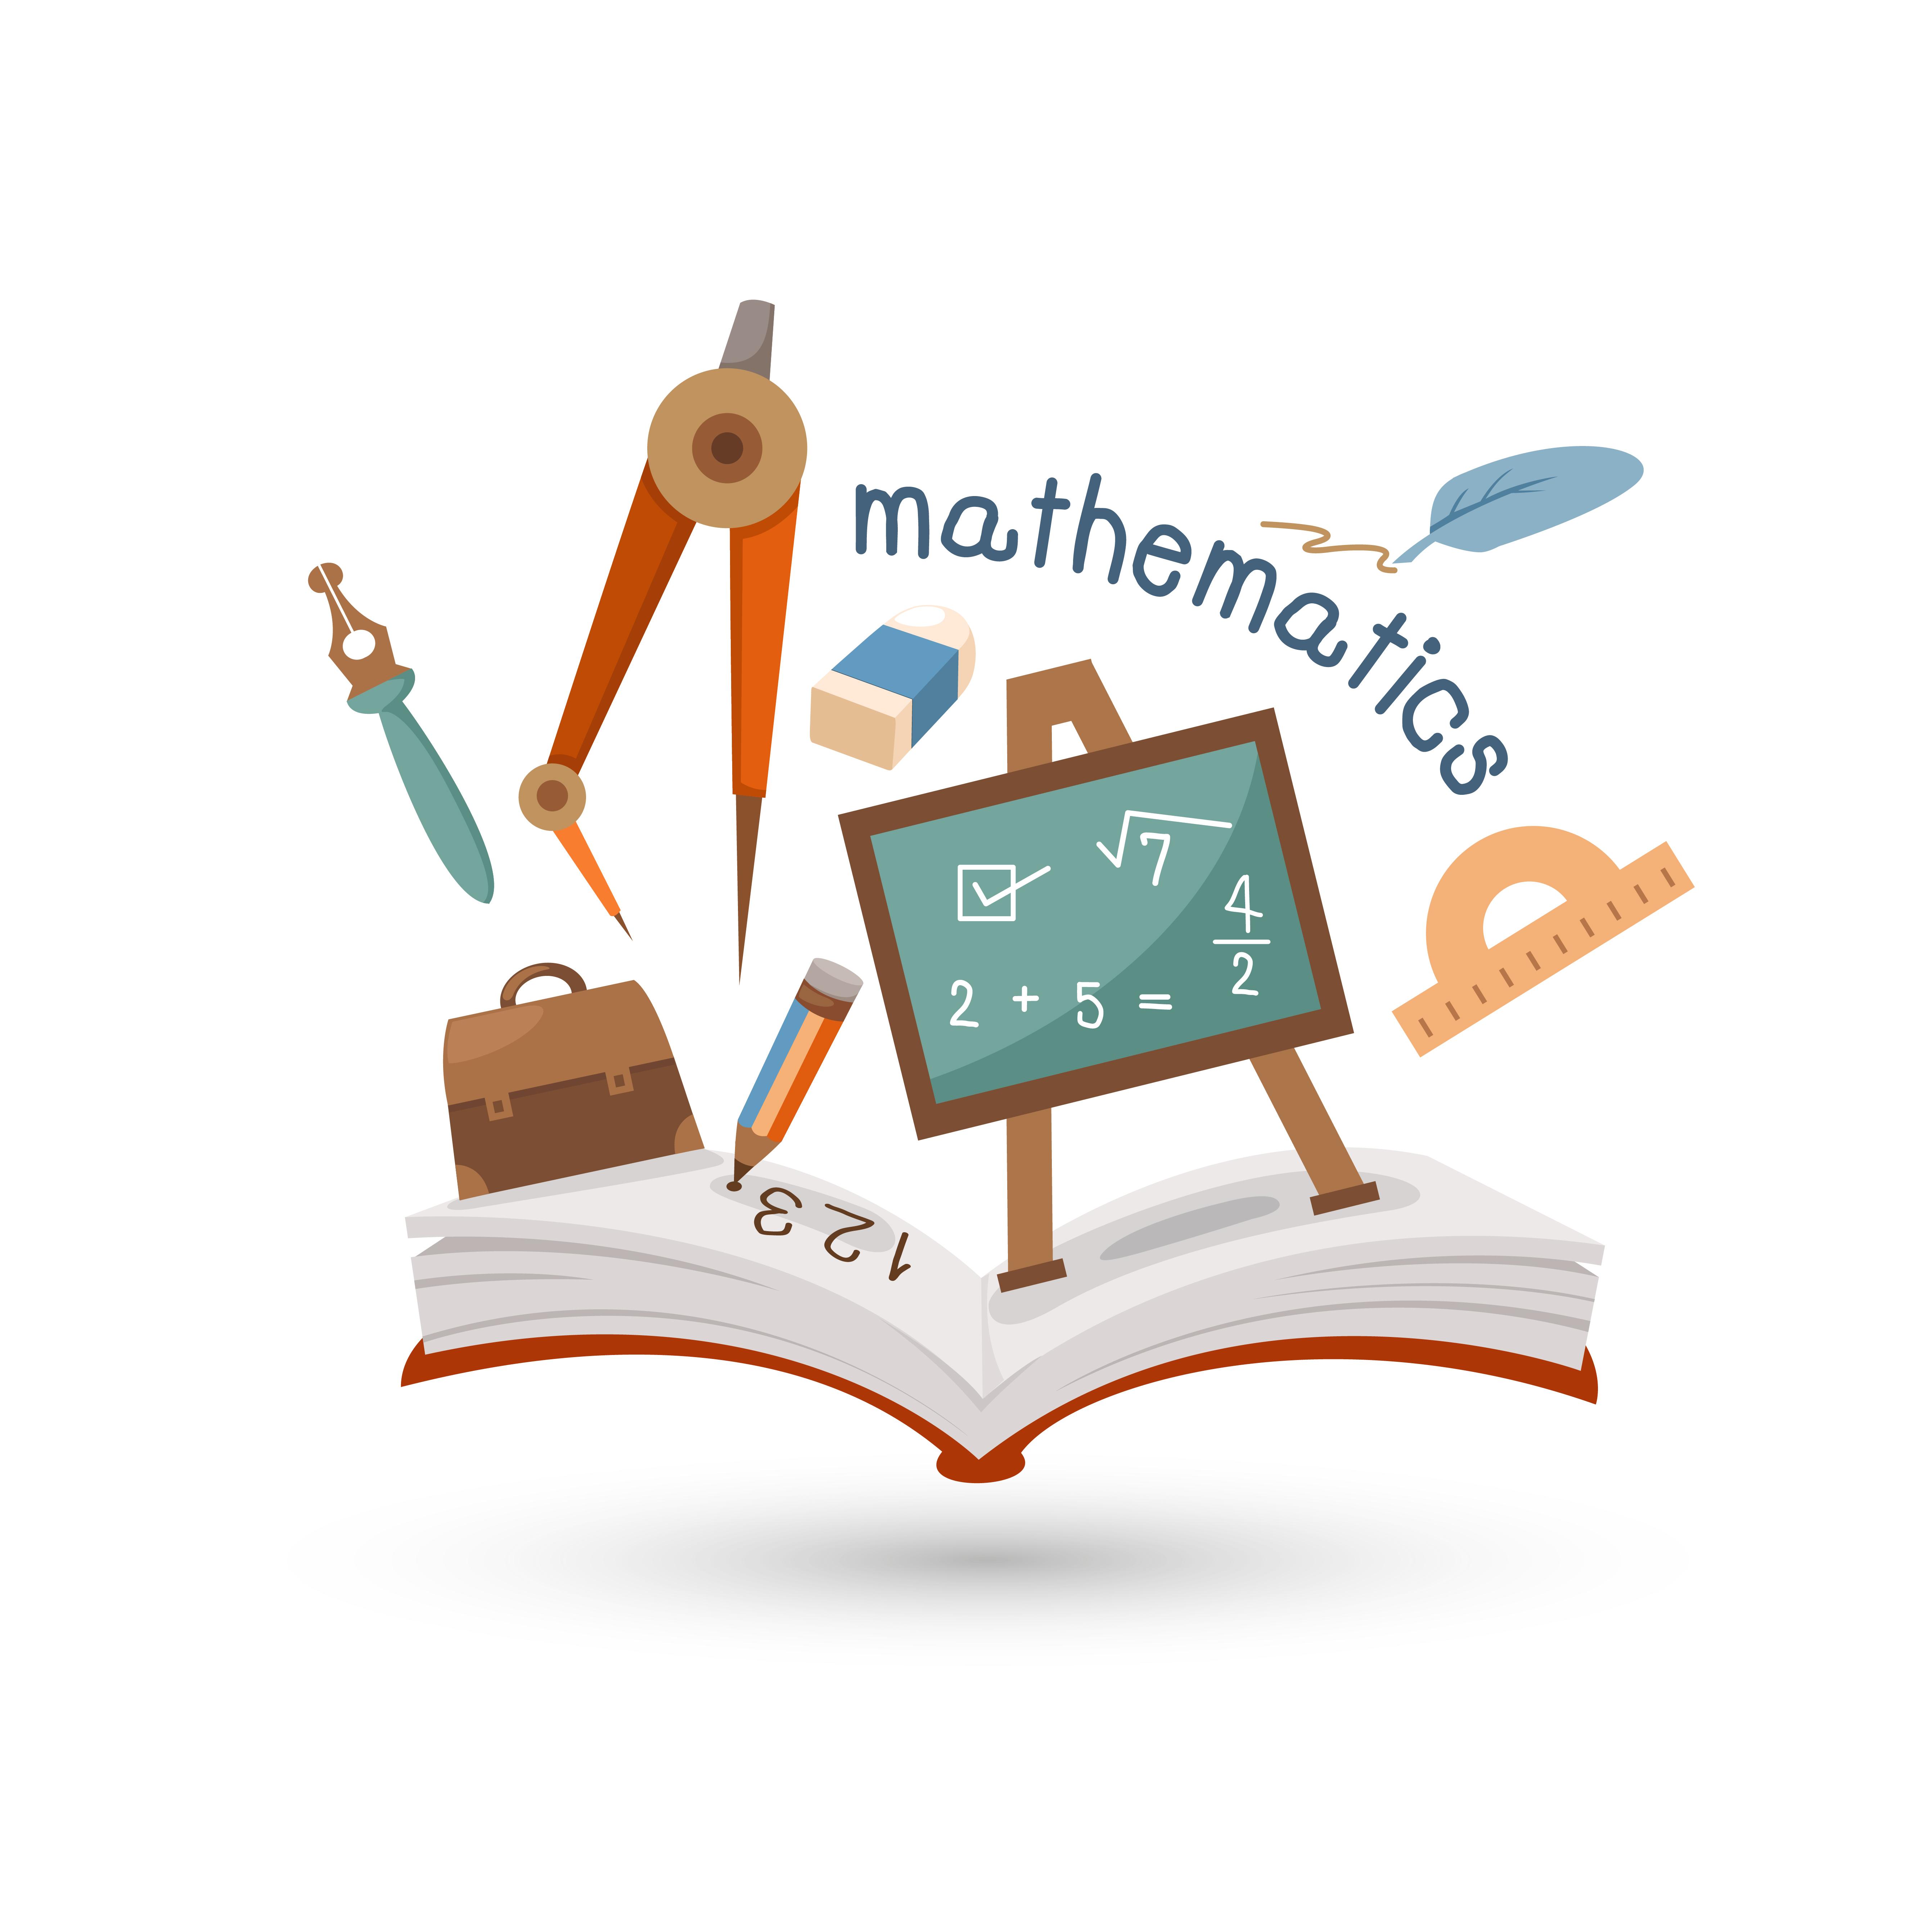 Gcse Math Tutor Worksheets tree diagrams worksheet gcse – Gcse Maths Tutor Worksheets